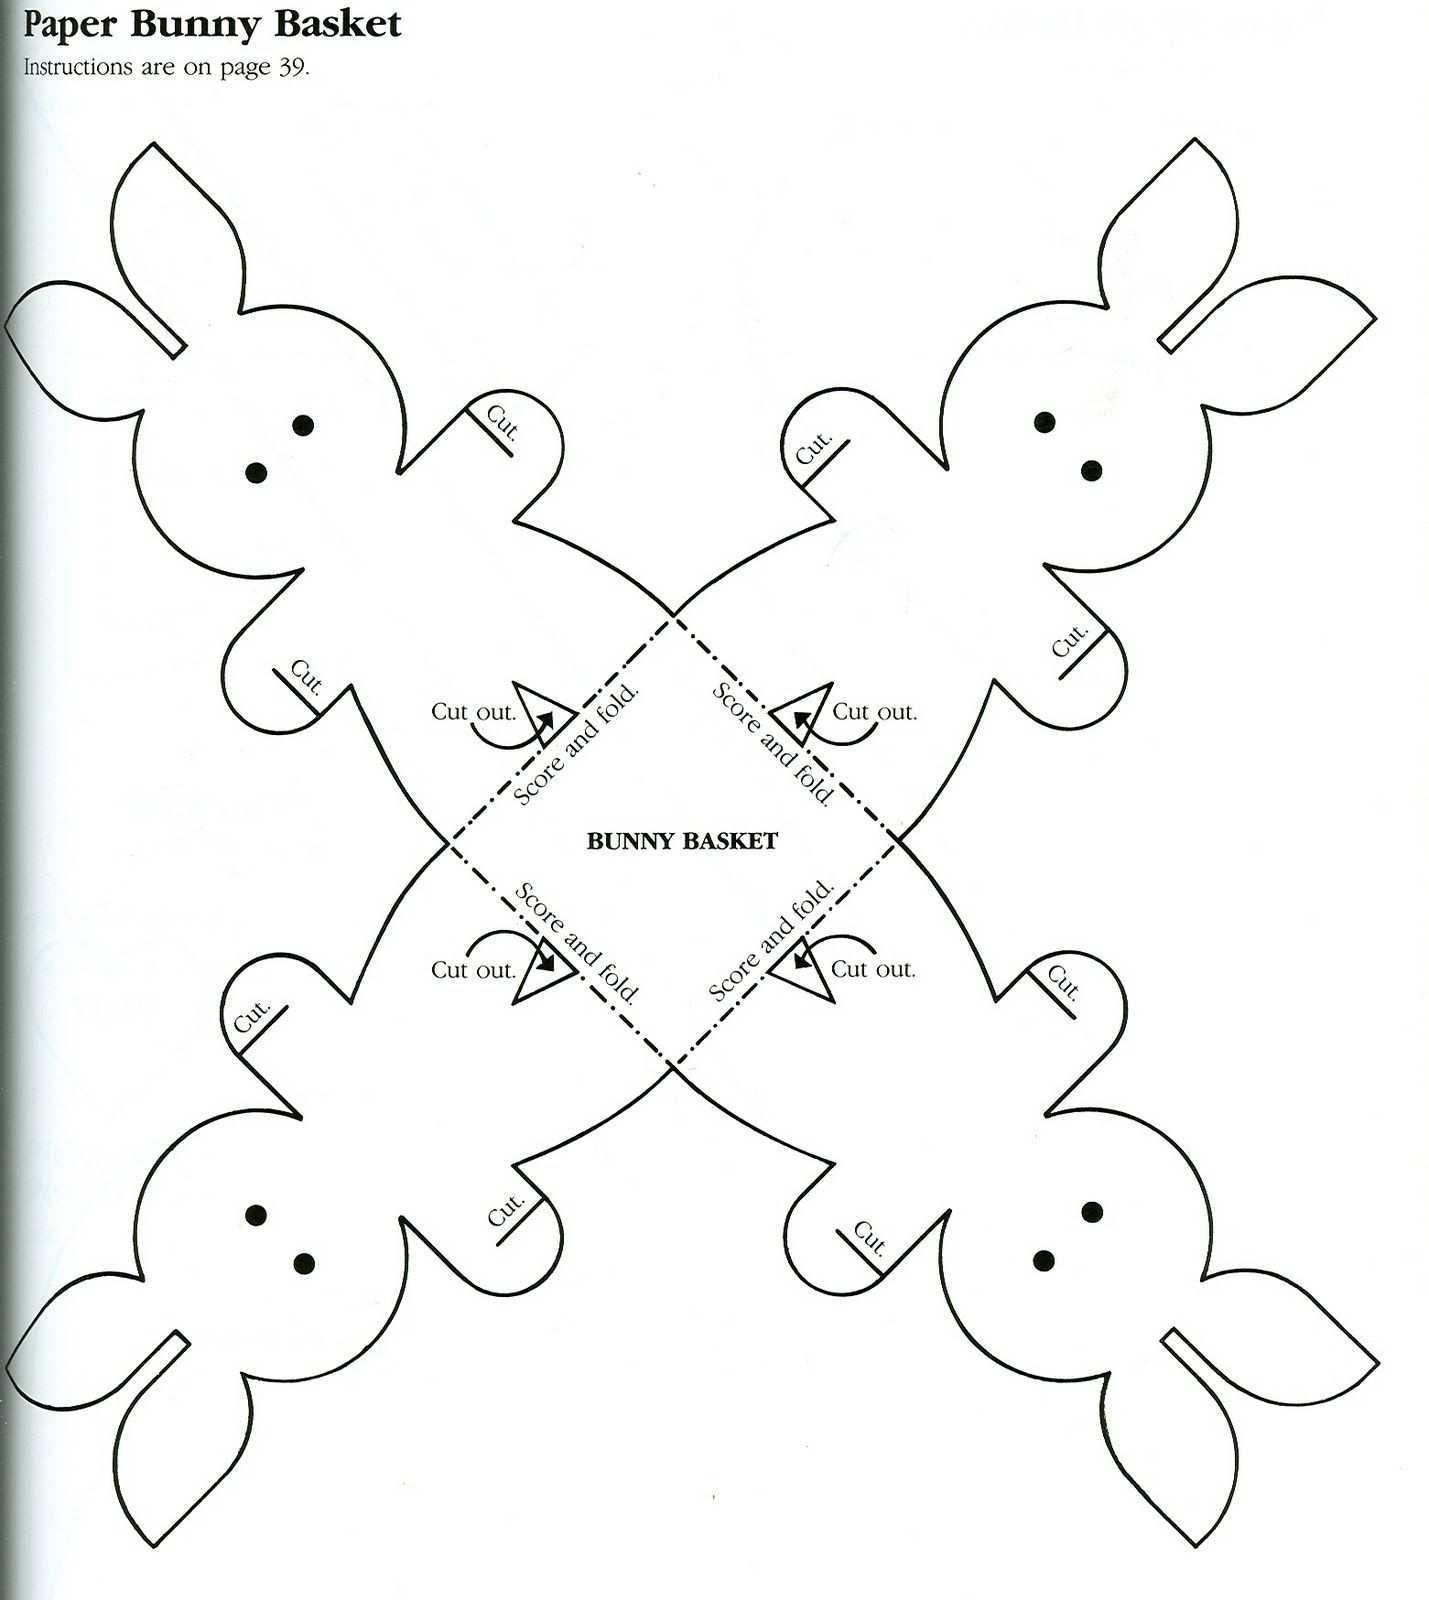 3 Bp Blogspot Com V7q7b0xifo8 Taitrhpwy0i Aaaaaaaaaho 3gbfkgvchjs S1600 Paper Bunny Basket Jpg Bastelvorlagen Ostern Basteln Ideen Ostern Osternest Basteln